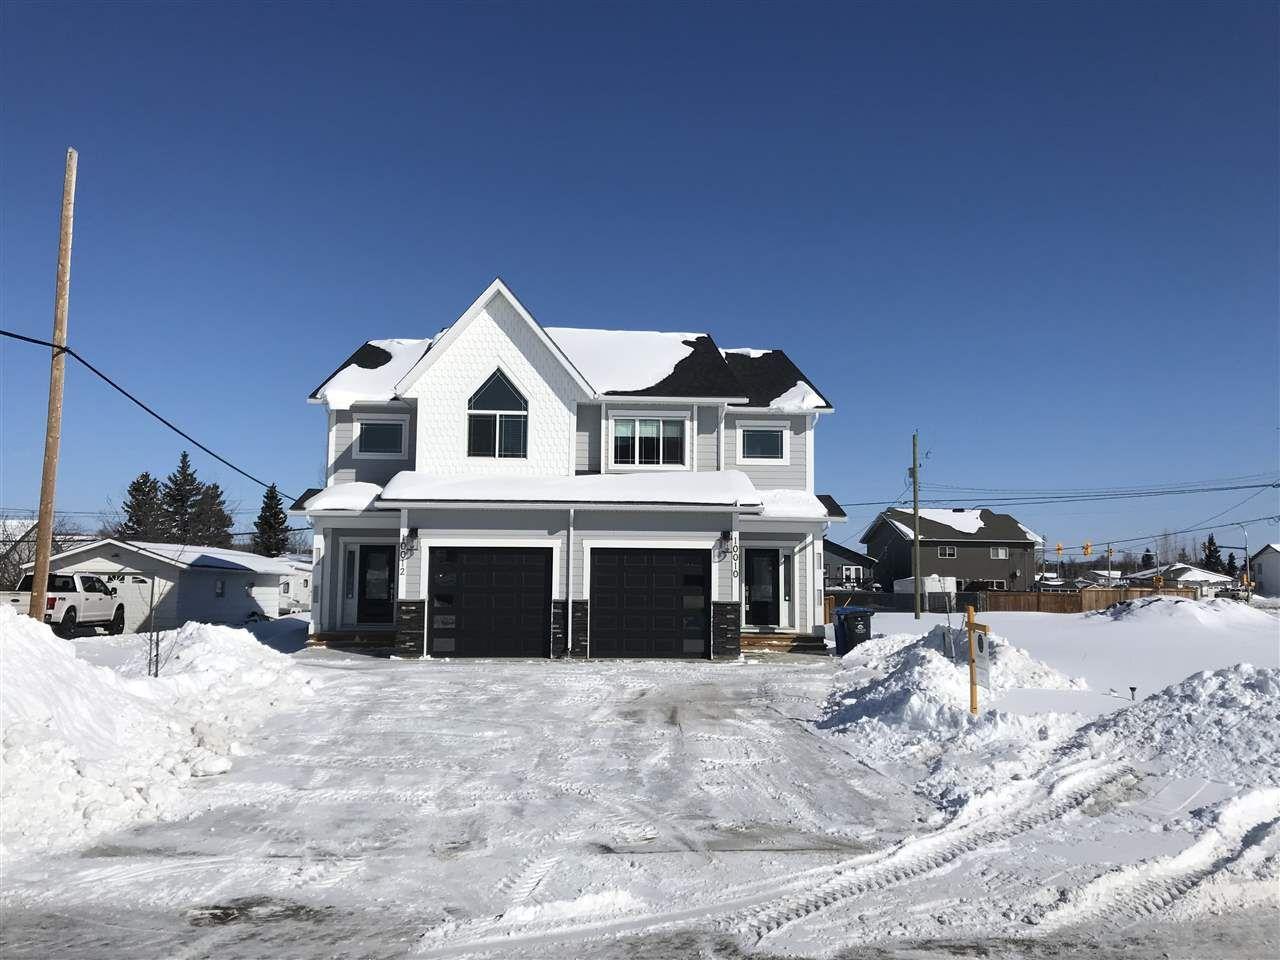 Main Photo: 10010 111 Avenue in Fort St. John: Fort St. John - City NW 1/2 Duplex for sale (Fort St. John (Zone 60))  : MLS®# R2443211